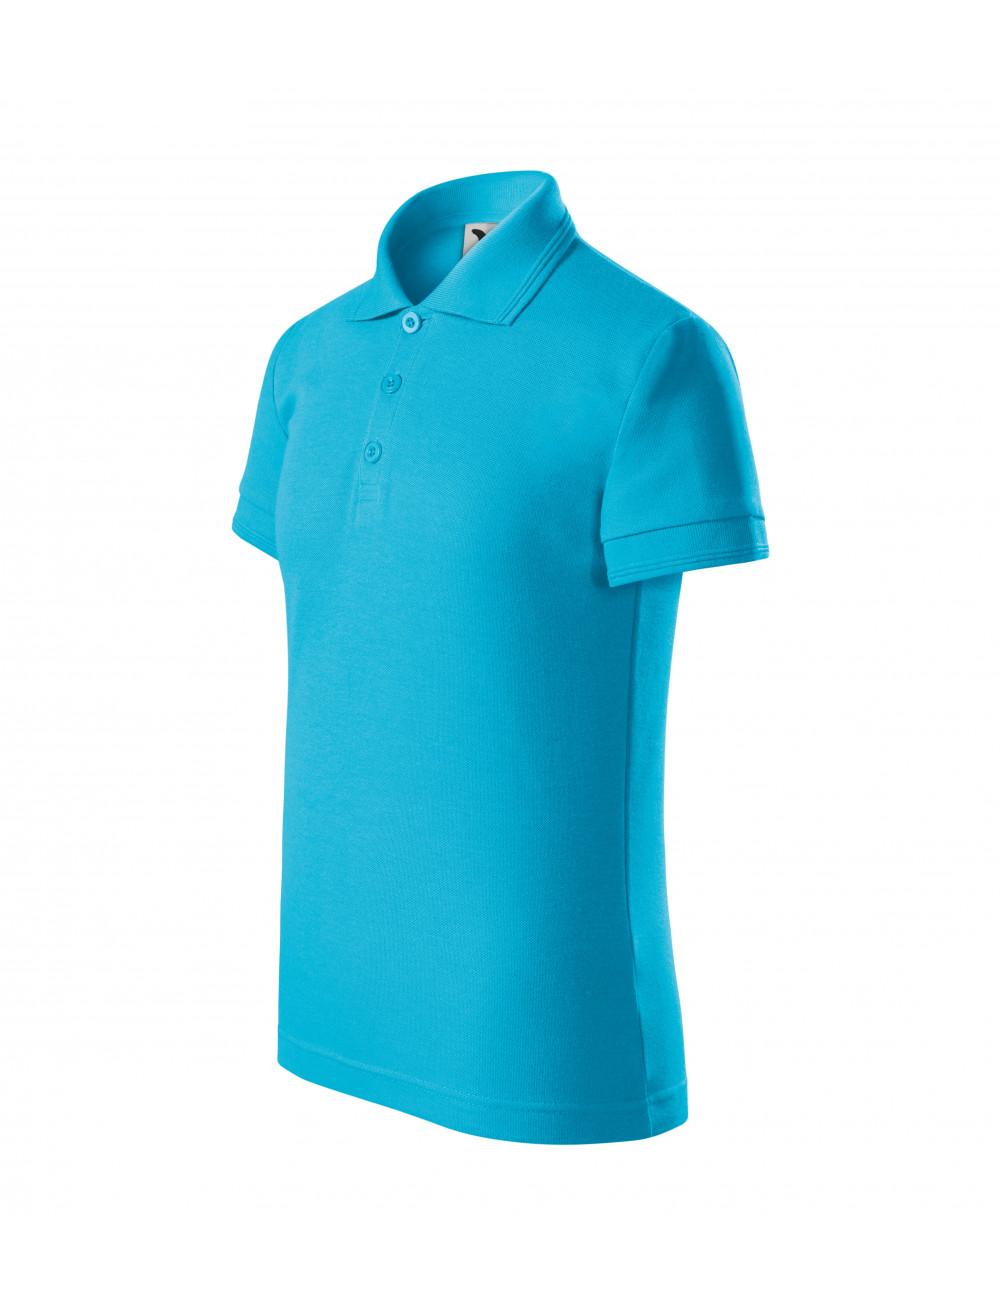 Adler MALFINI Koszulka polo dziecięca Pique Polo 222 turkus